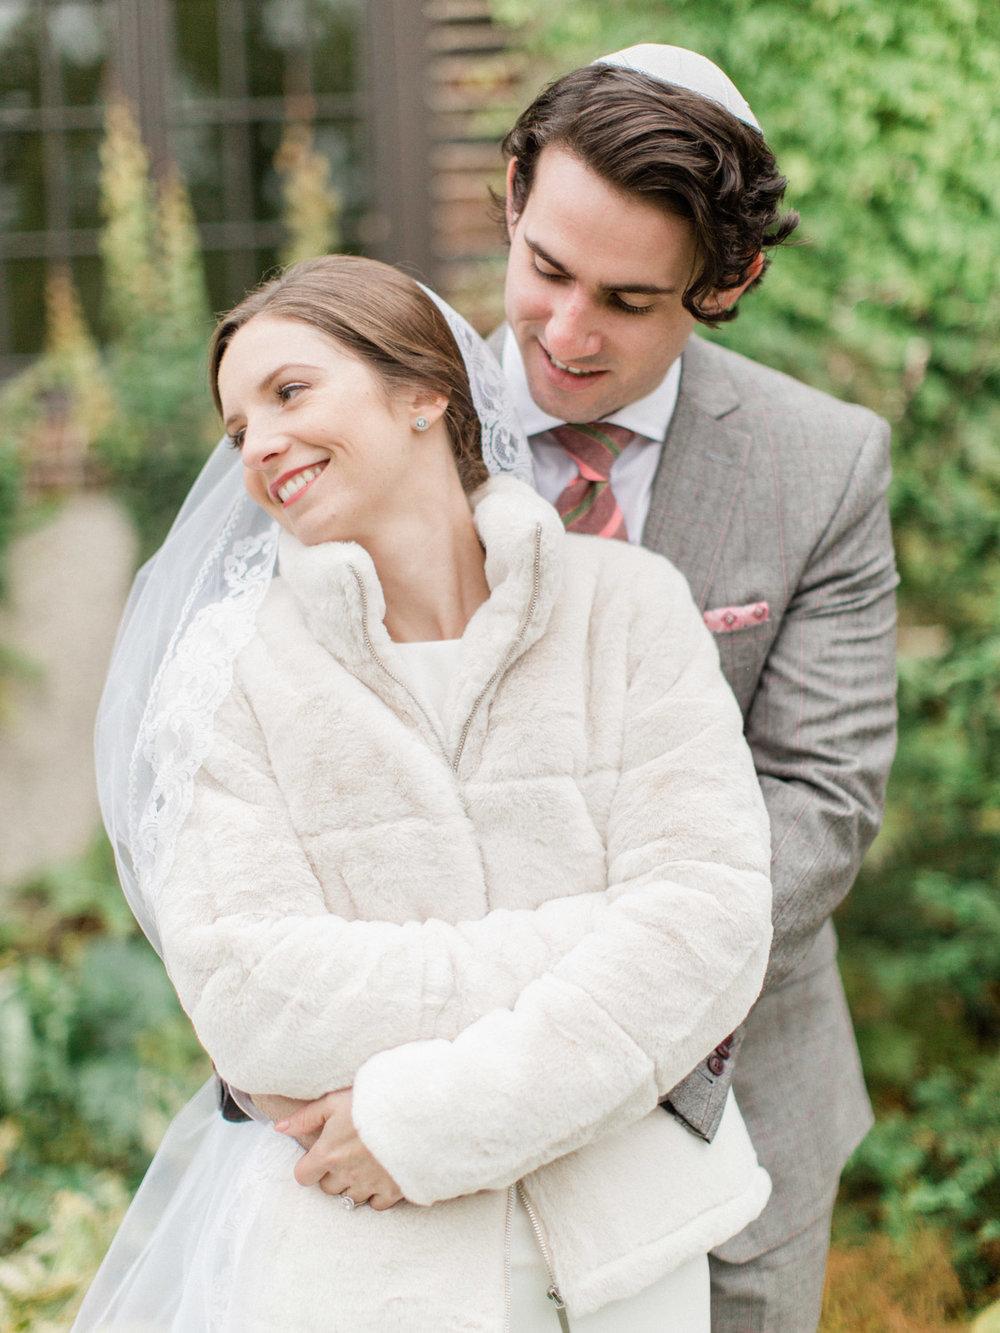 Toronto-wedding-photographer-st-georges-golf-club-jewish-modern-fall33.jpg